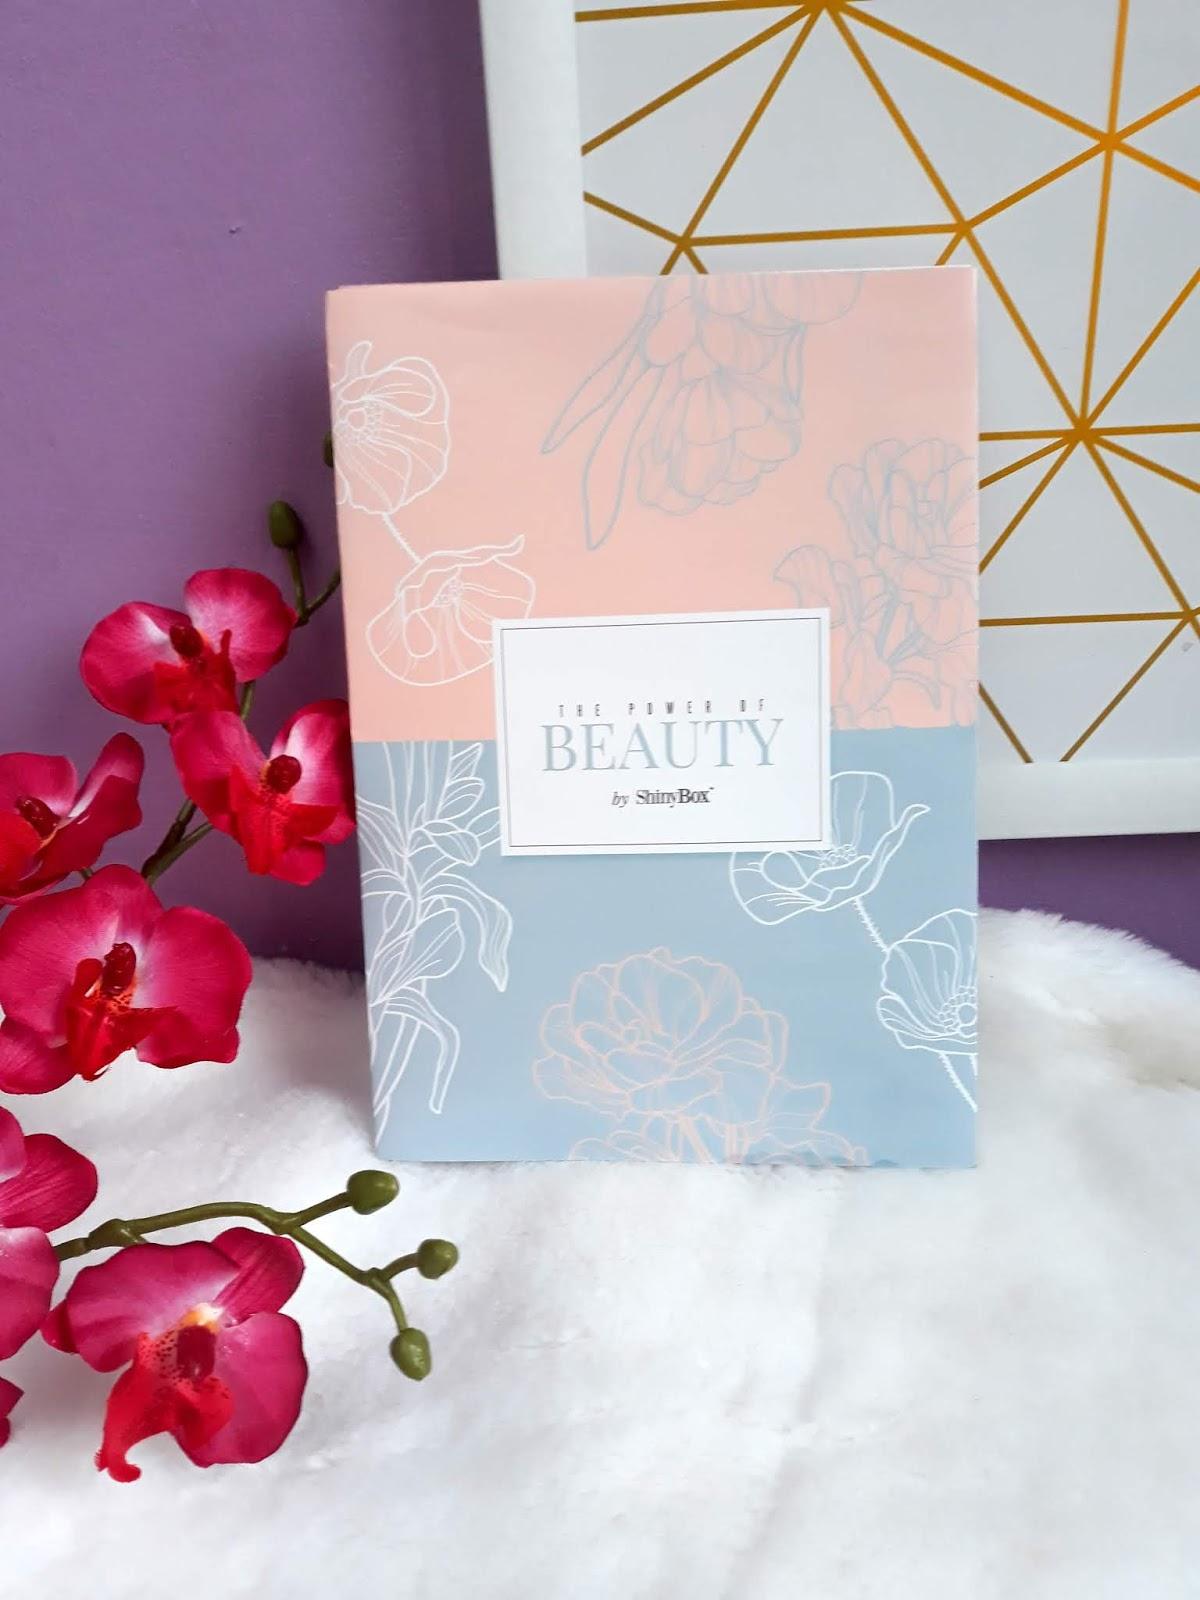 ShinyBox The Power of Beauty